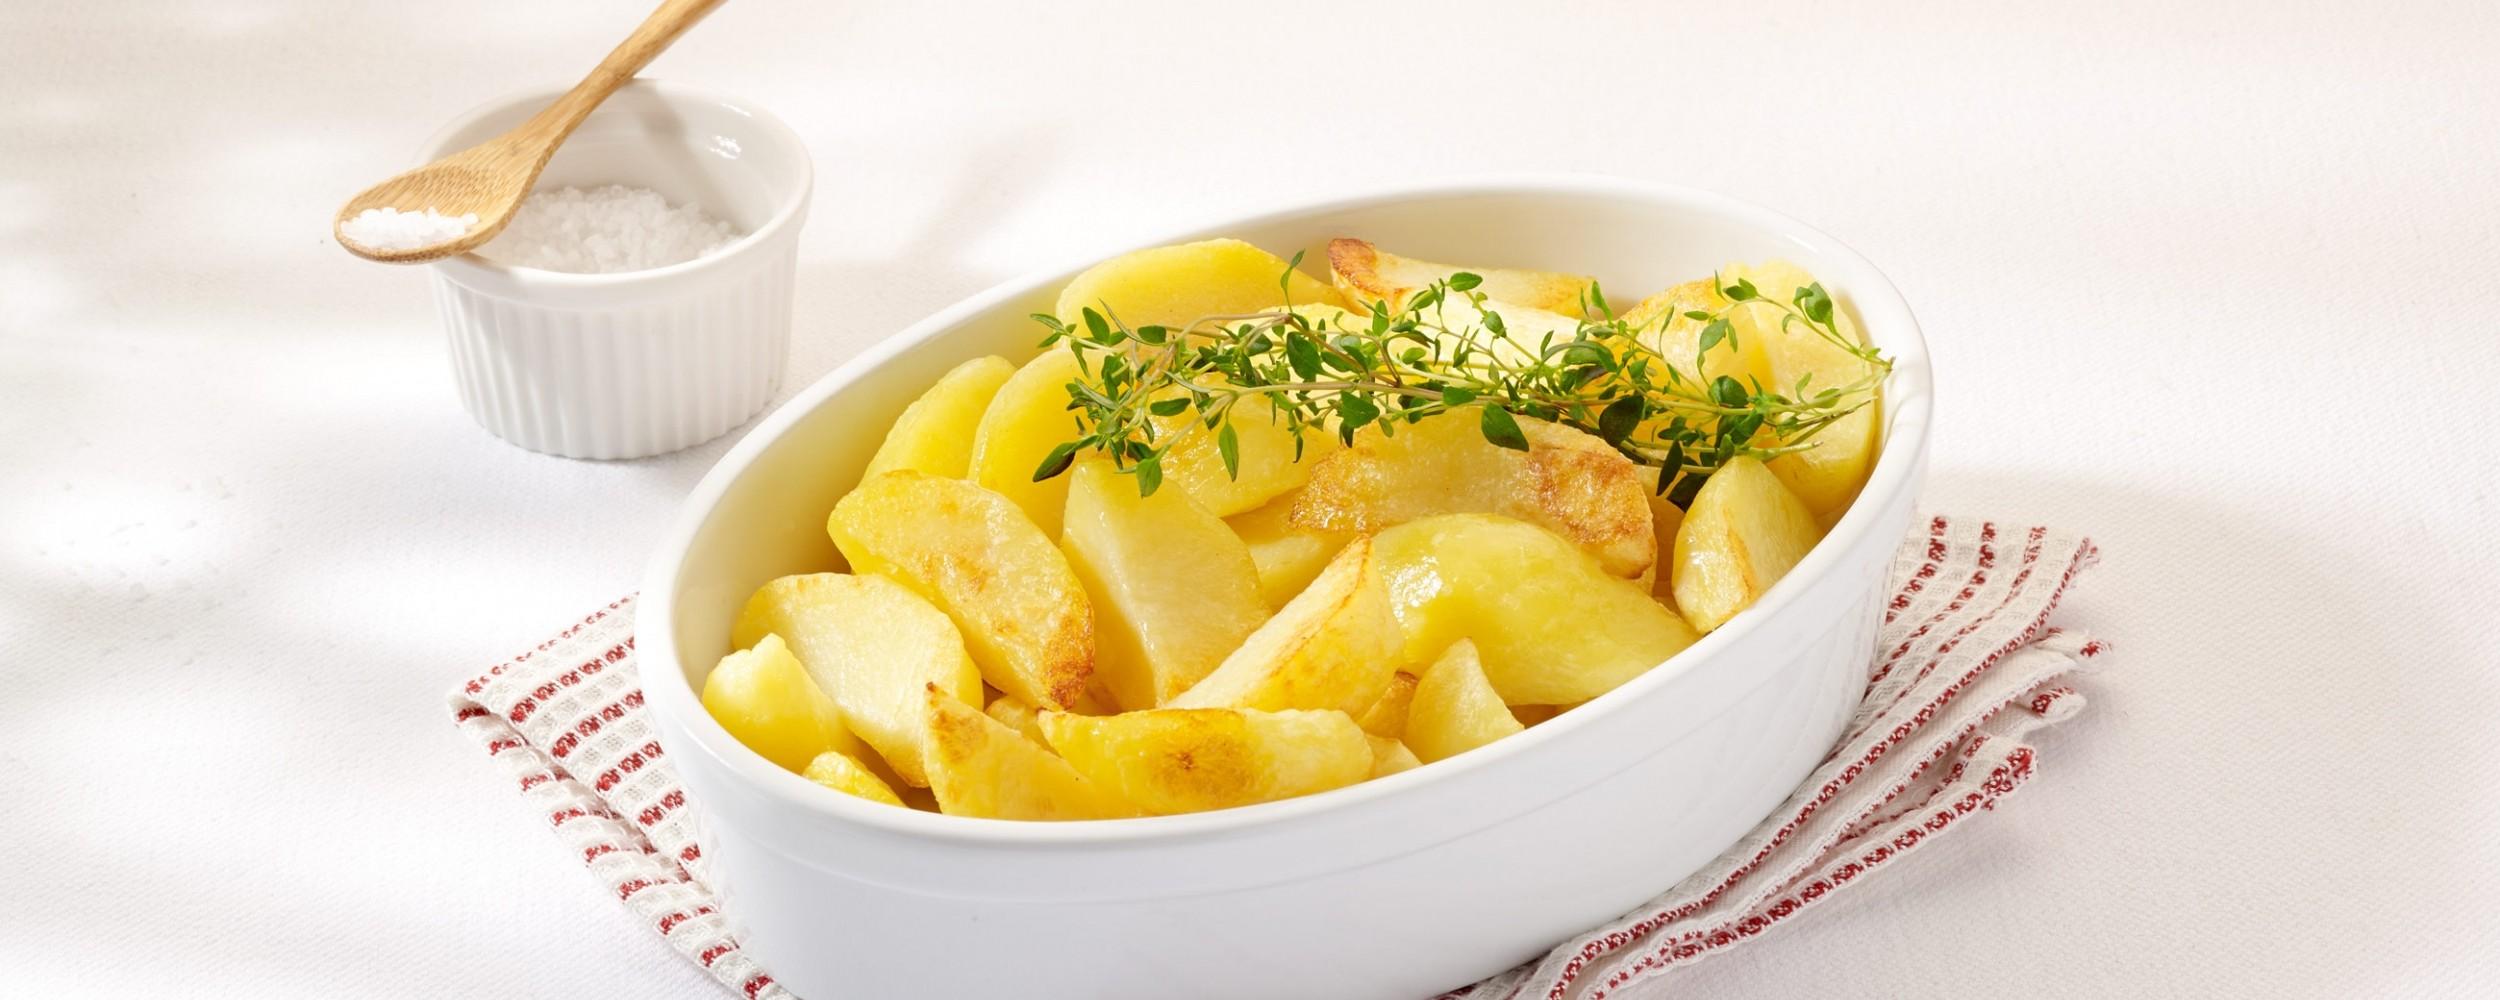 Potato quarters